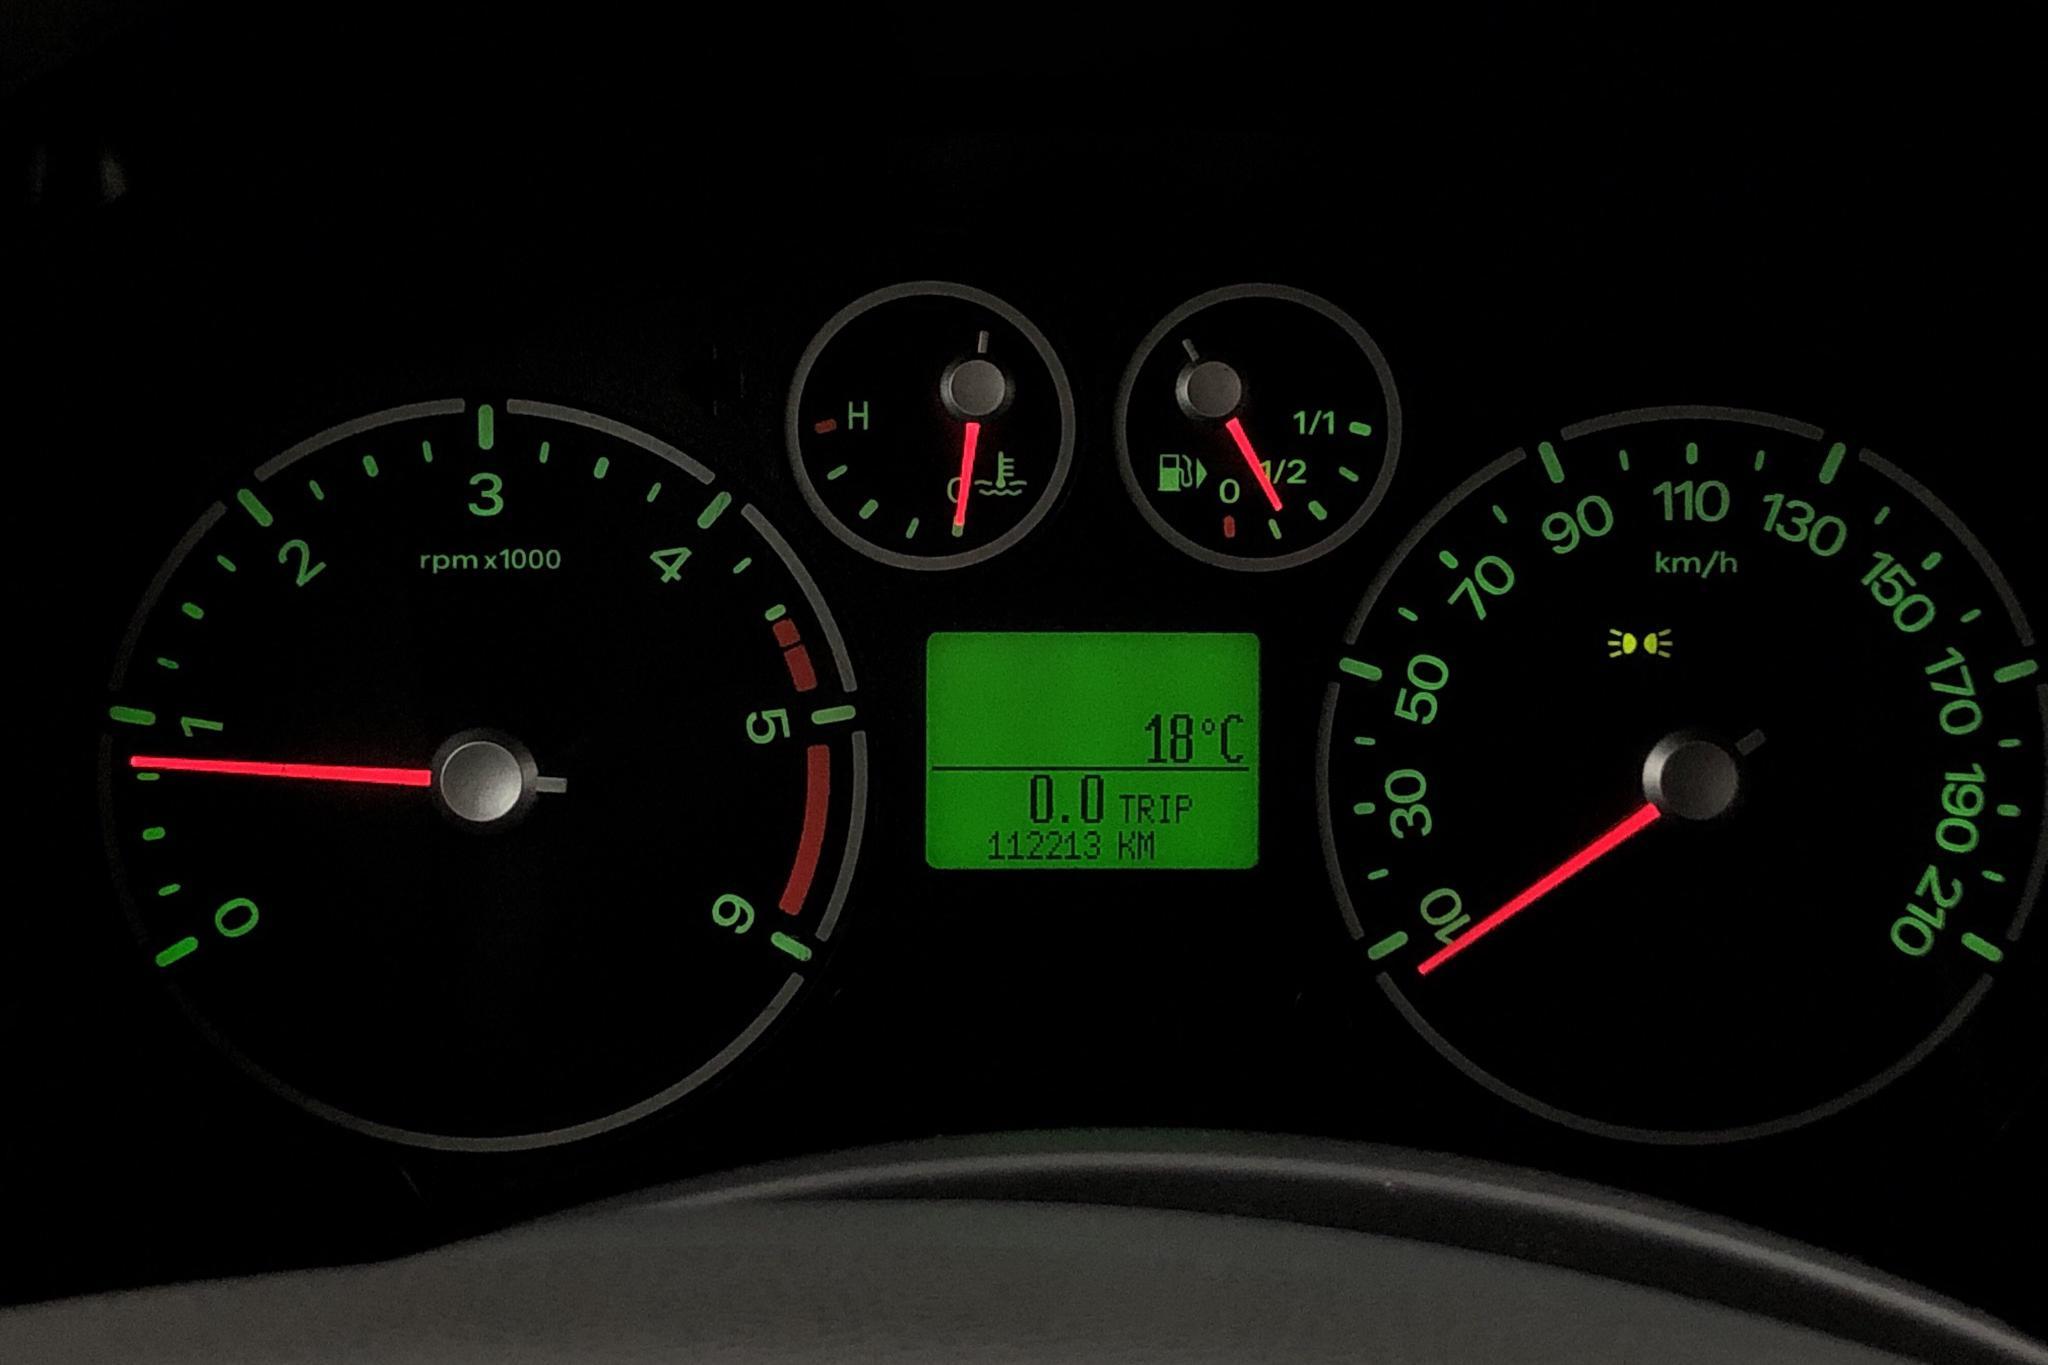 Ford Transit Connect 1.8 TDCi (90hk) - 11 221 mil - Manuell - vit - 2010